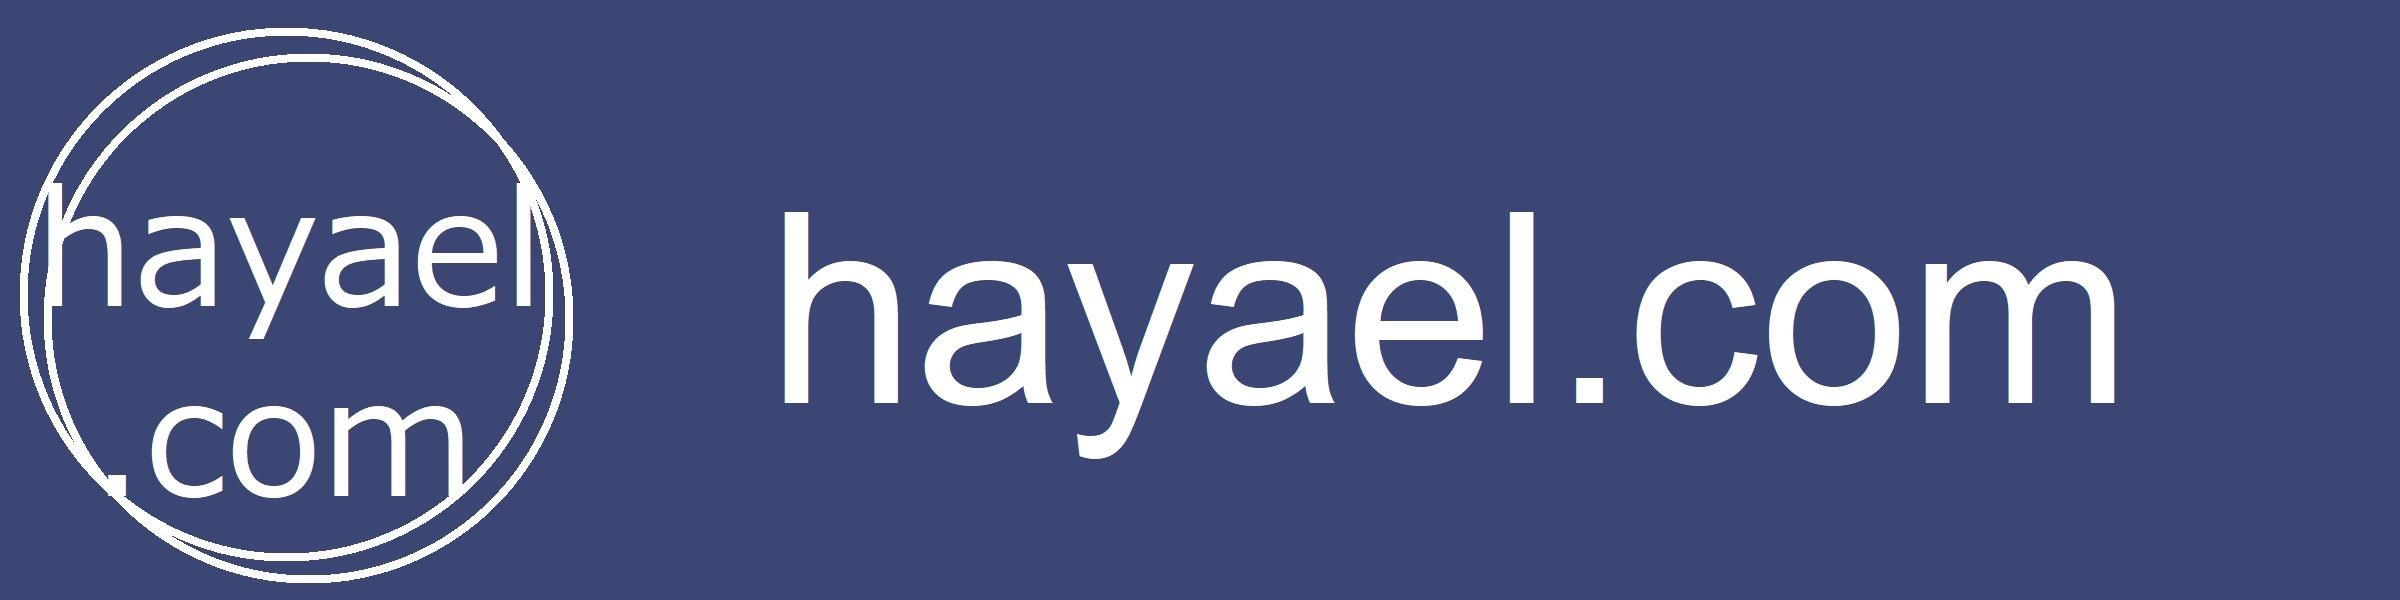 hayael.com